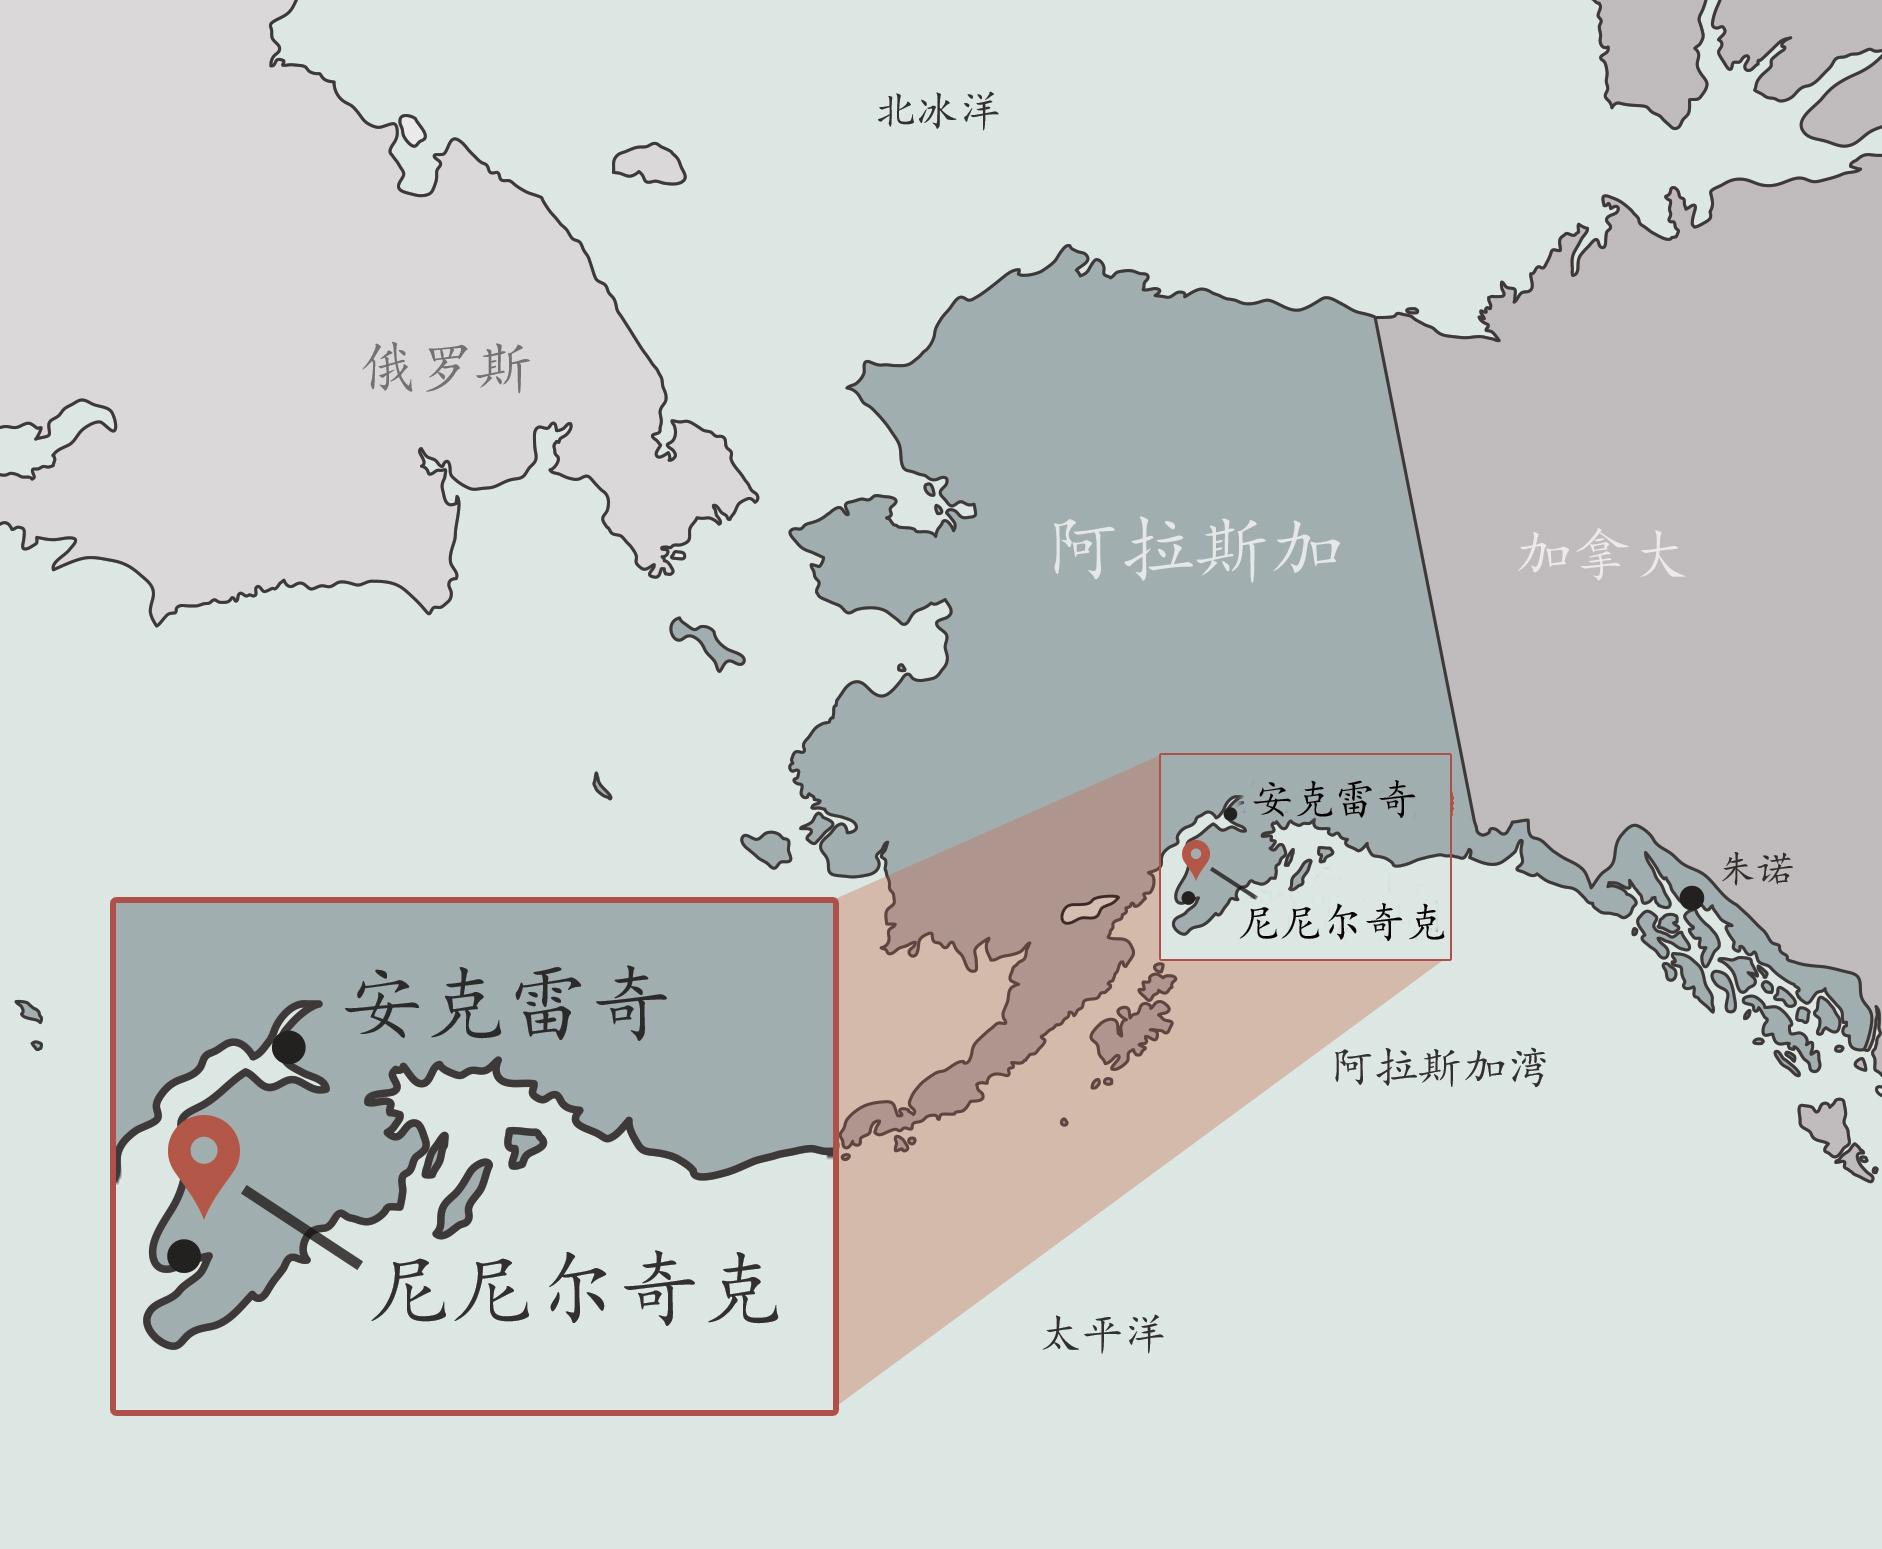 Map of Alaska with inset highlighting location of Ninilchik (State Dept./O. Mertz)